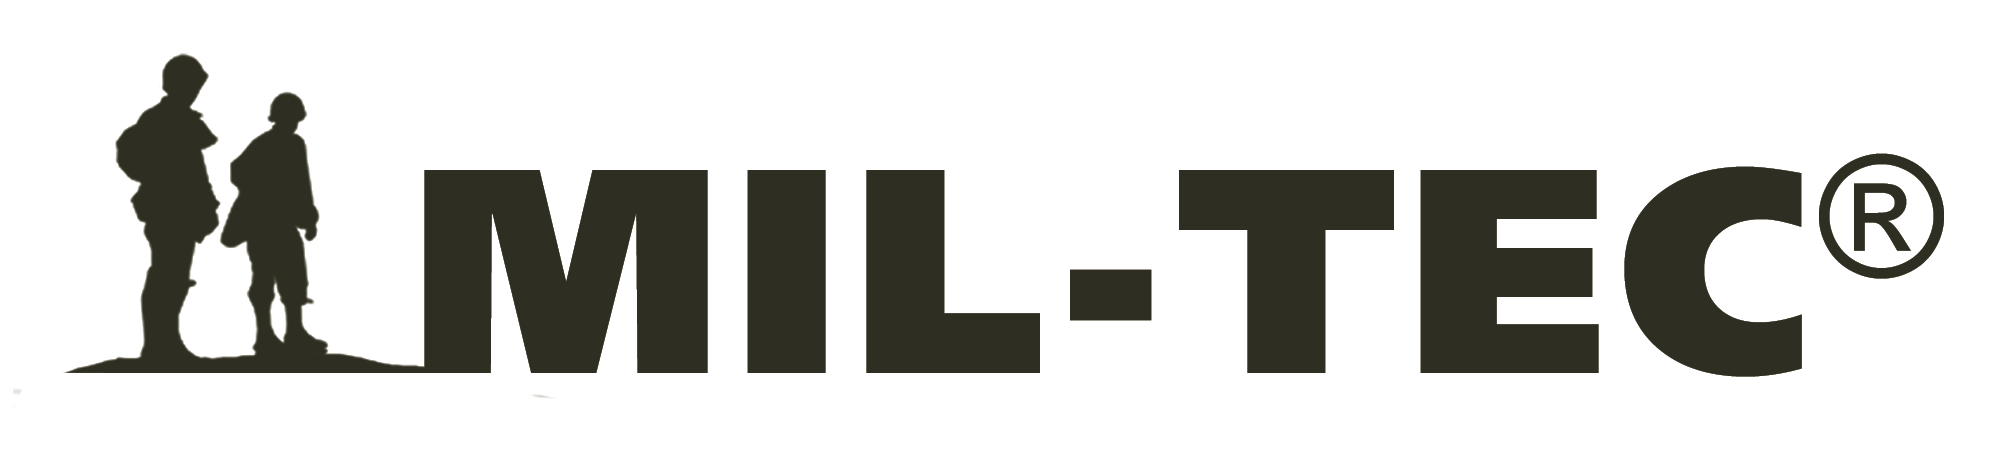 Logo de MILTEC: Especialistas en ropa táctica, equipo militar, equipo policial